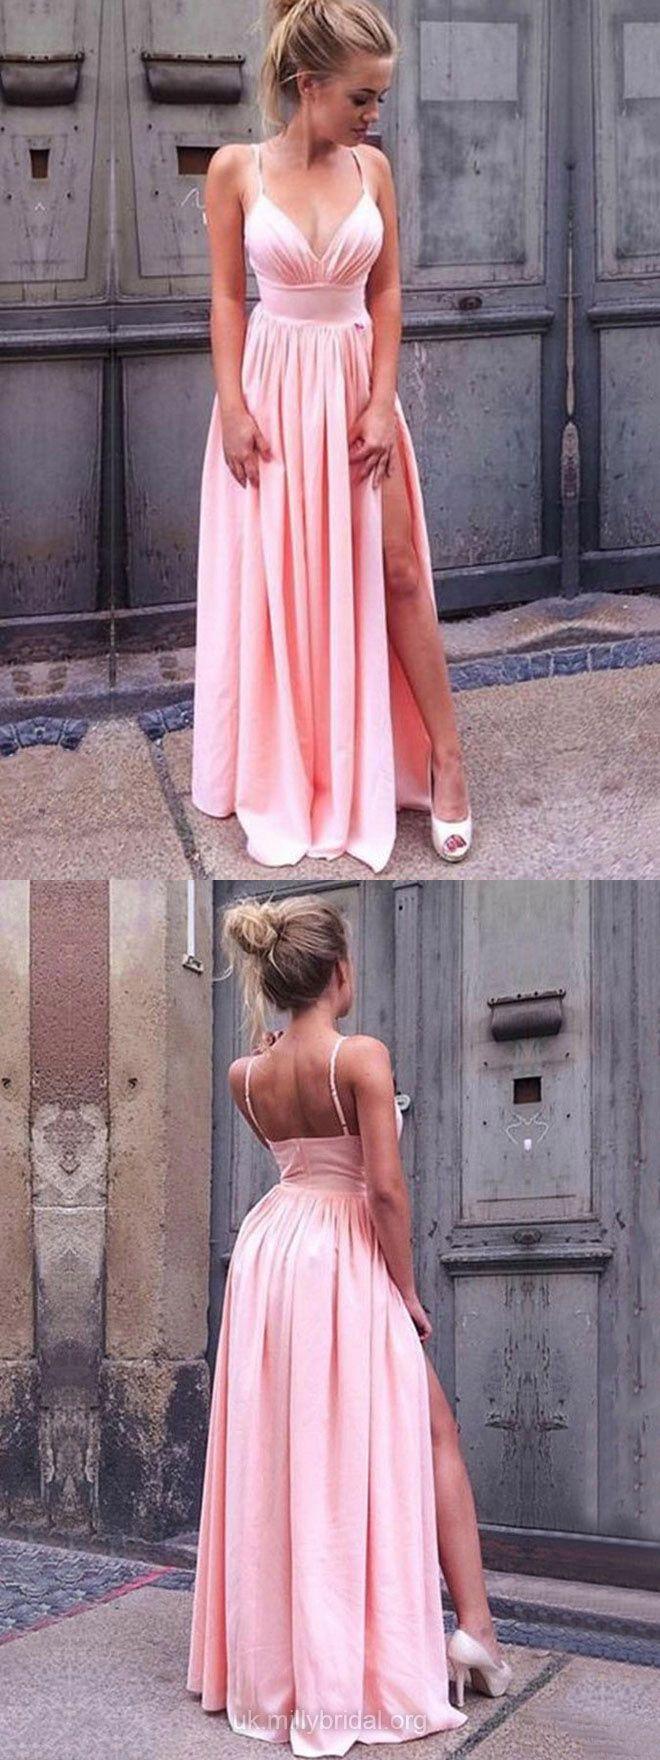 Pink Prom Dresses, Long Prom Dresses With Slit, Formal Prom Dresses ...